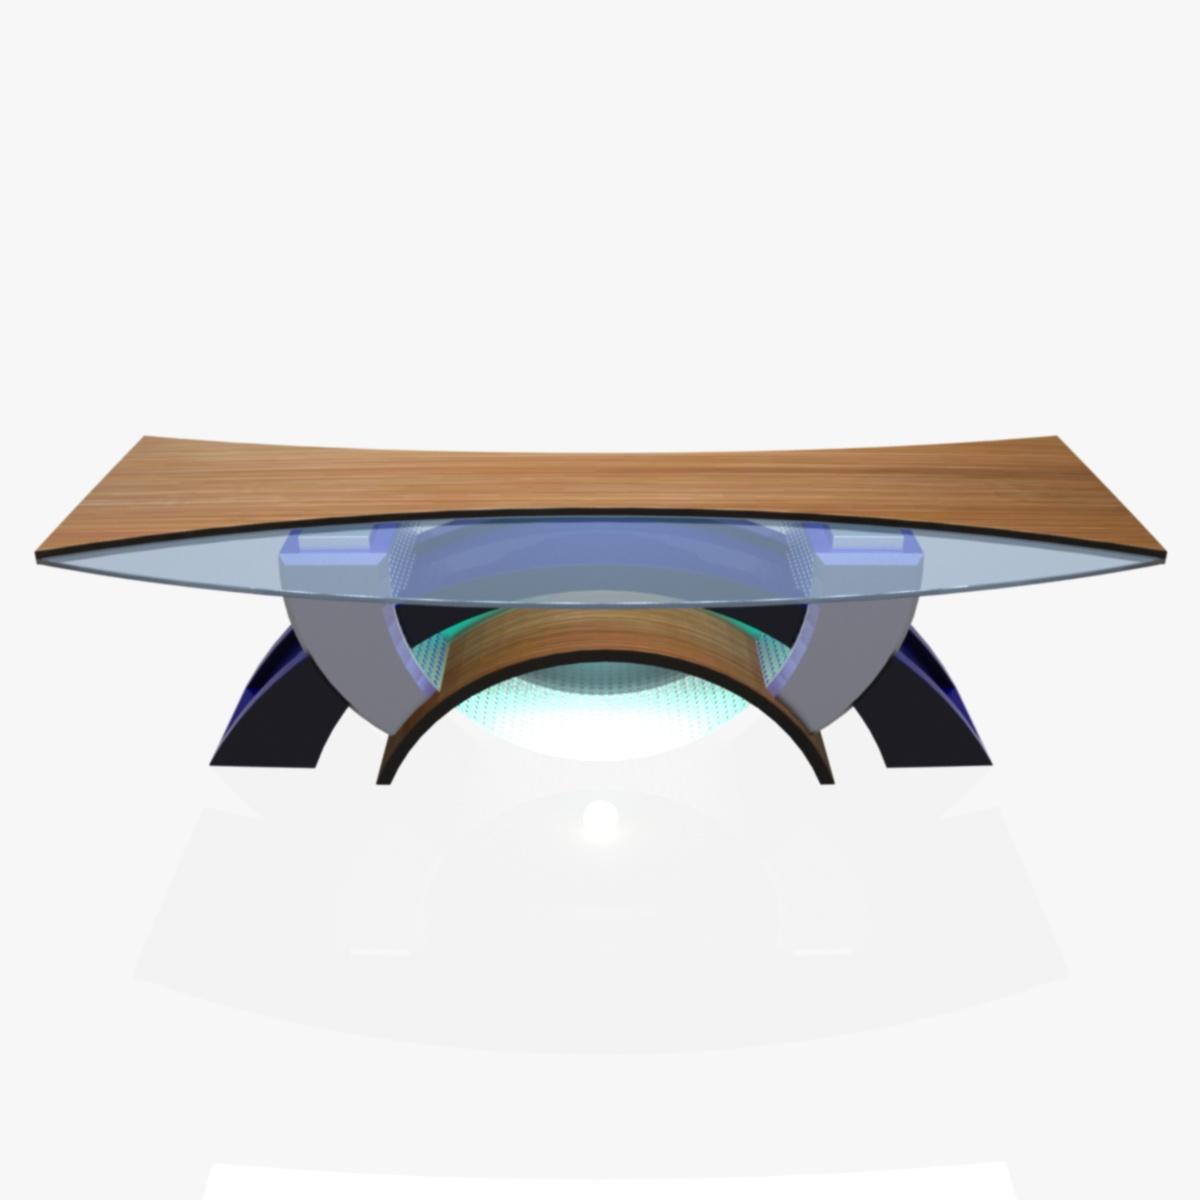 Virtual Tv Studio News Desk 2 3d Model Furniture 3d Models  # Meuble Tv Nesx